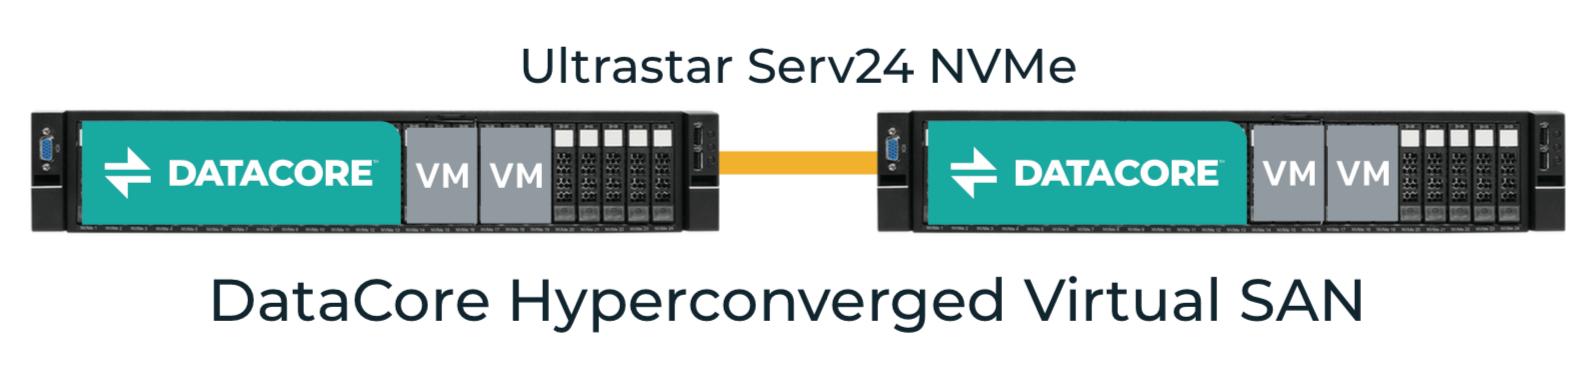 Ultrastar Serv24 NVMe Hyperconverged Virtual SAN